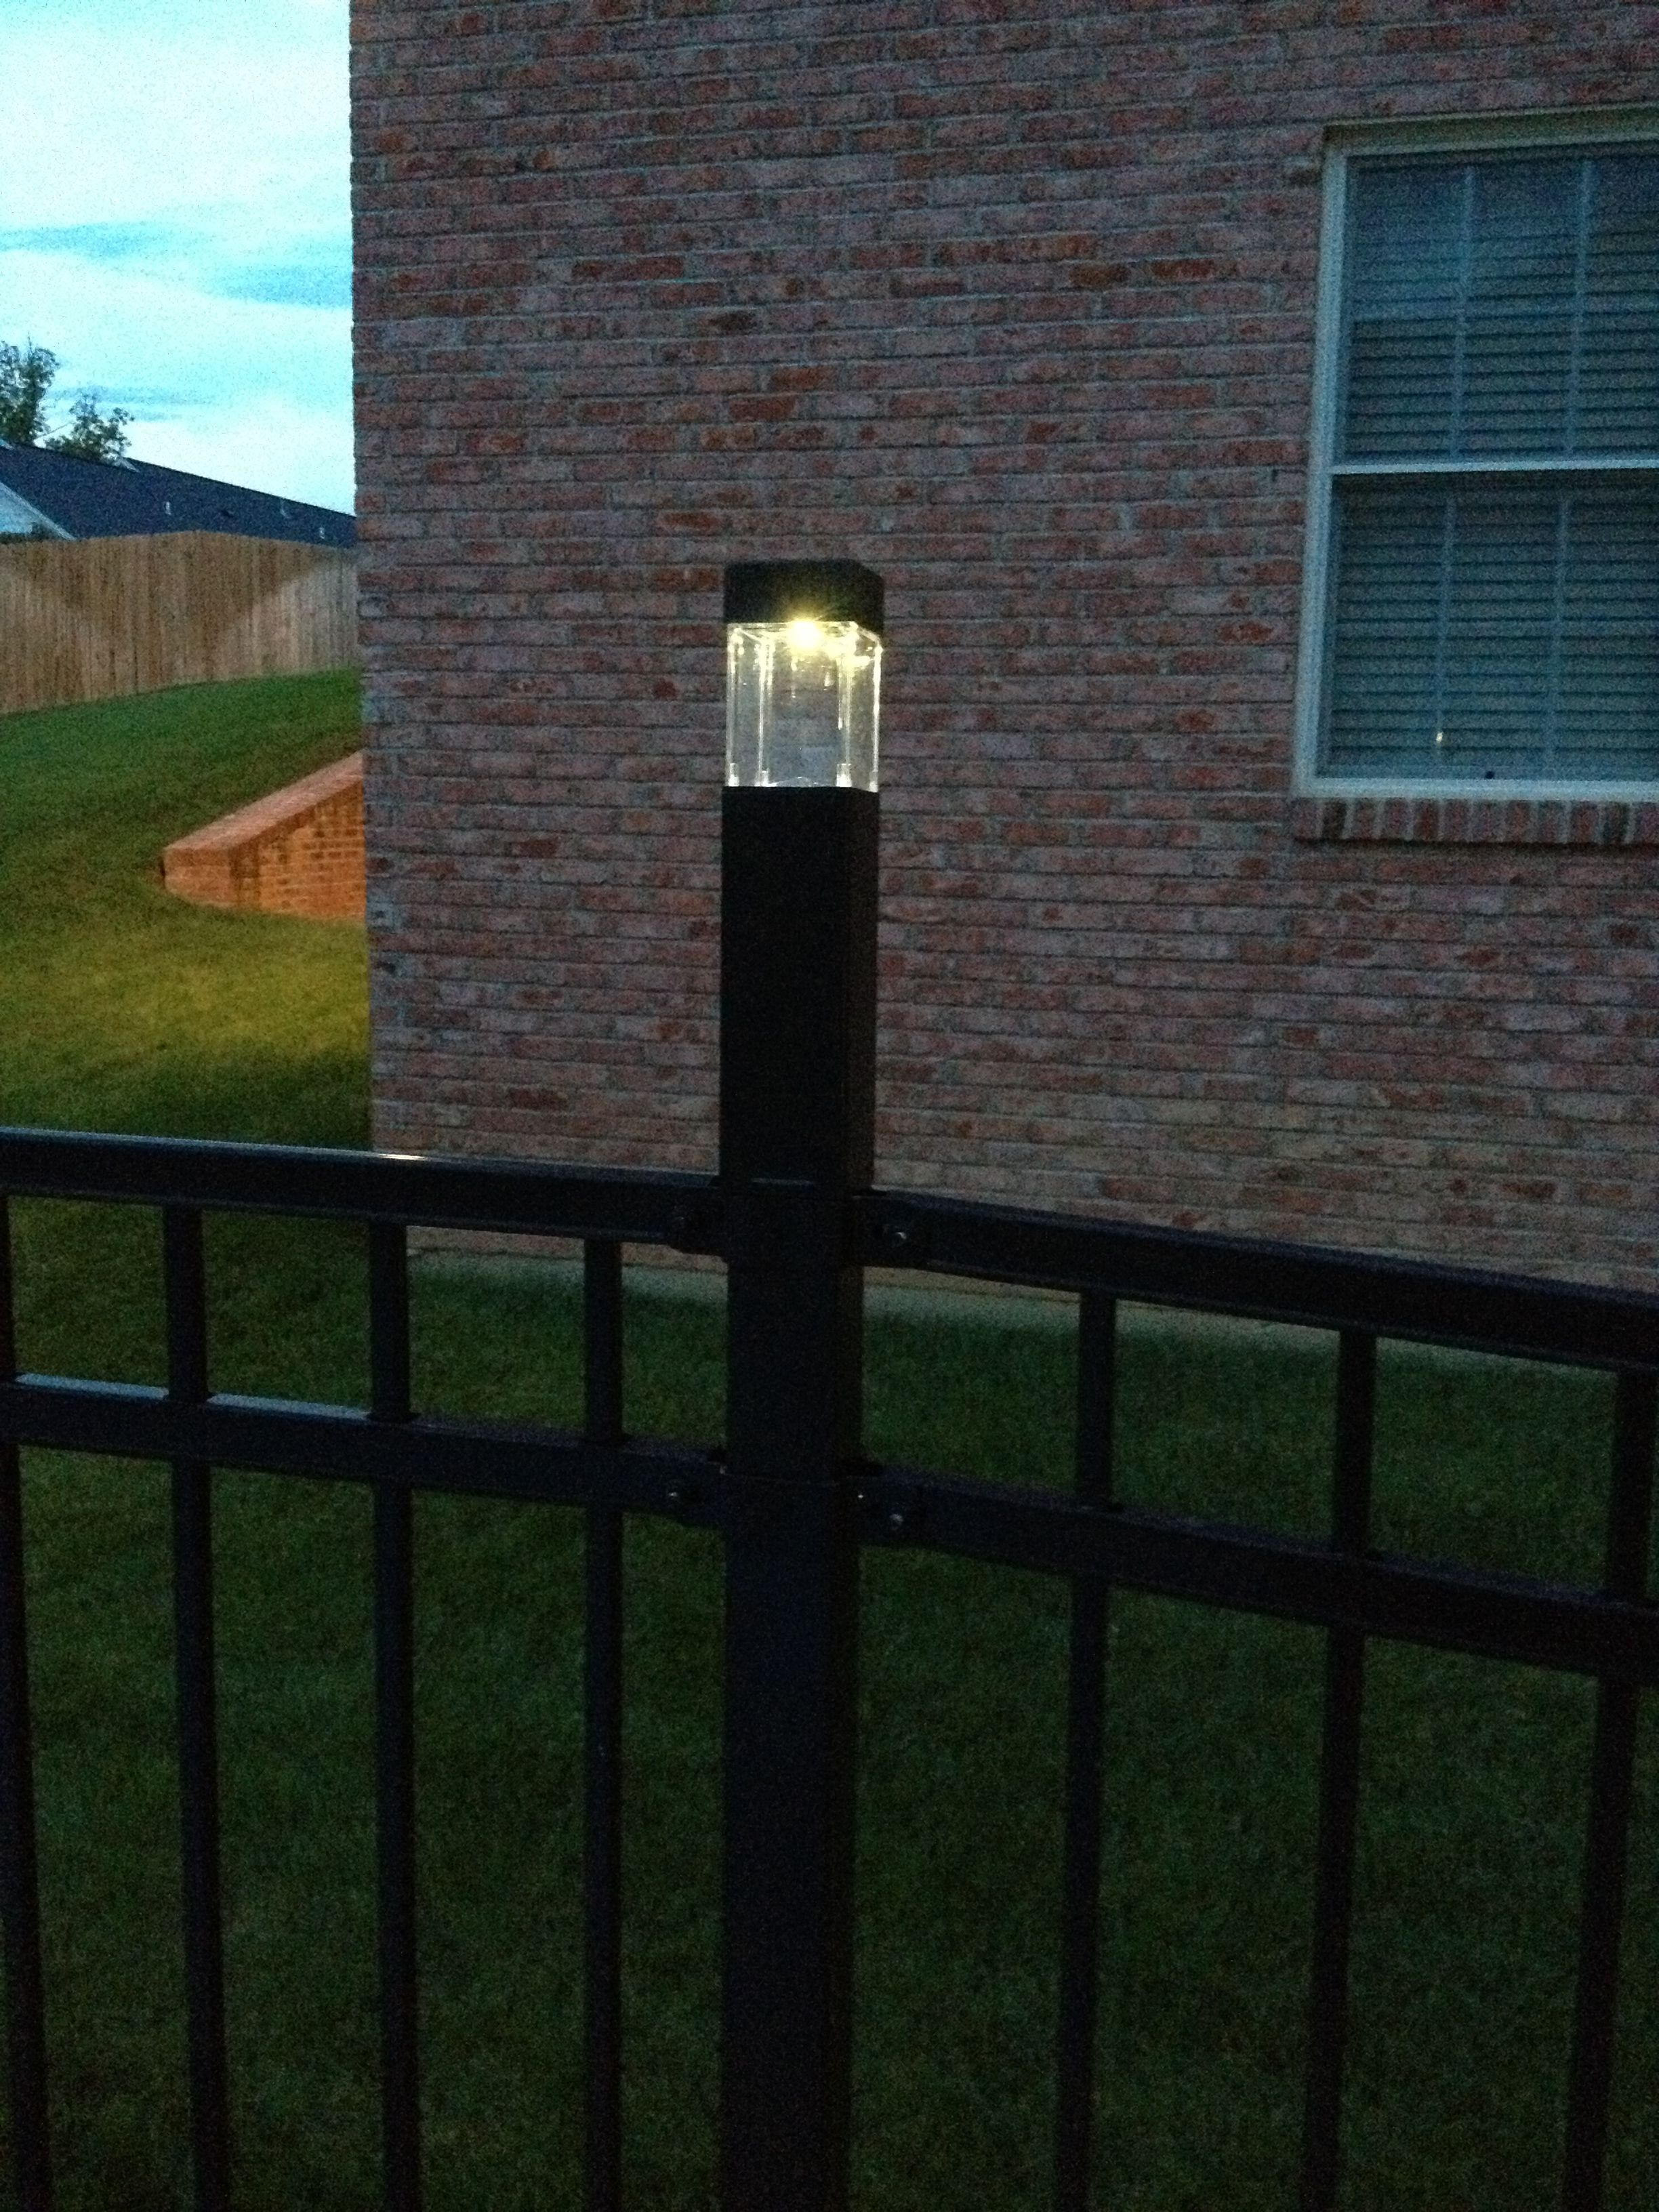 Pin By Richard Lynn On Home Improvement Fence Post Caps Solar Lights Solar Lamp Post